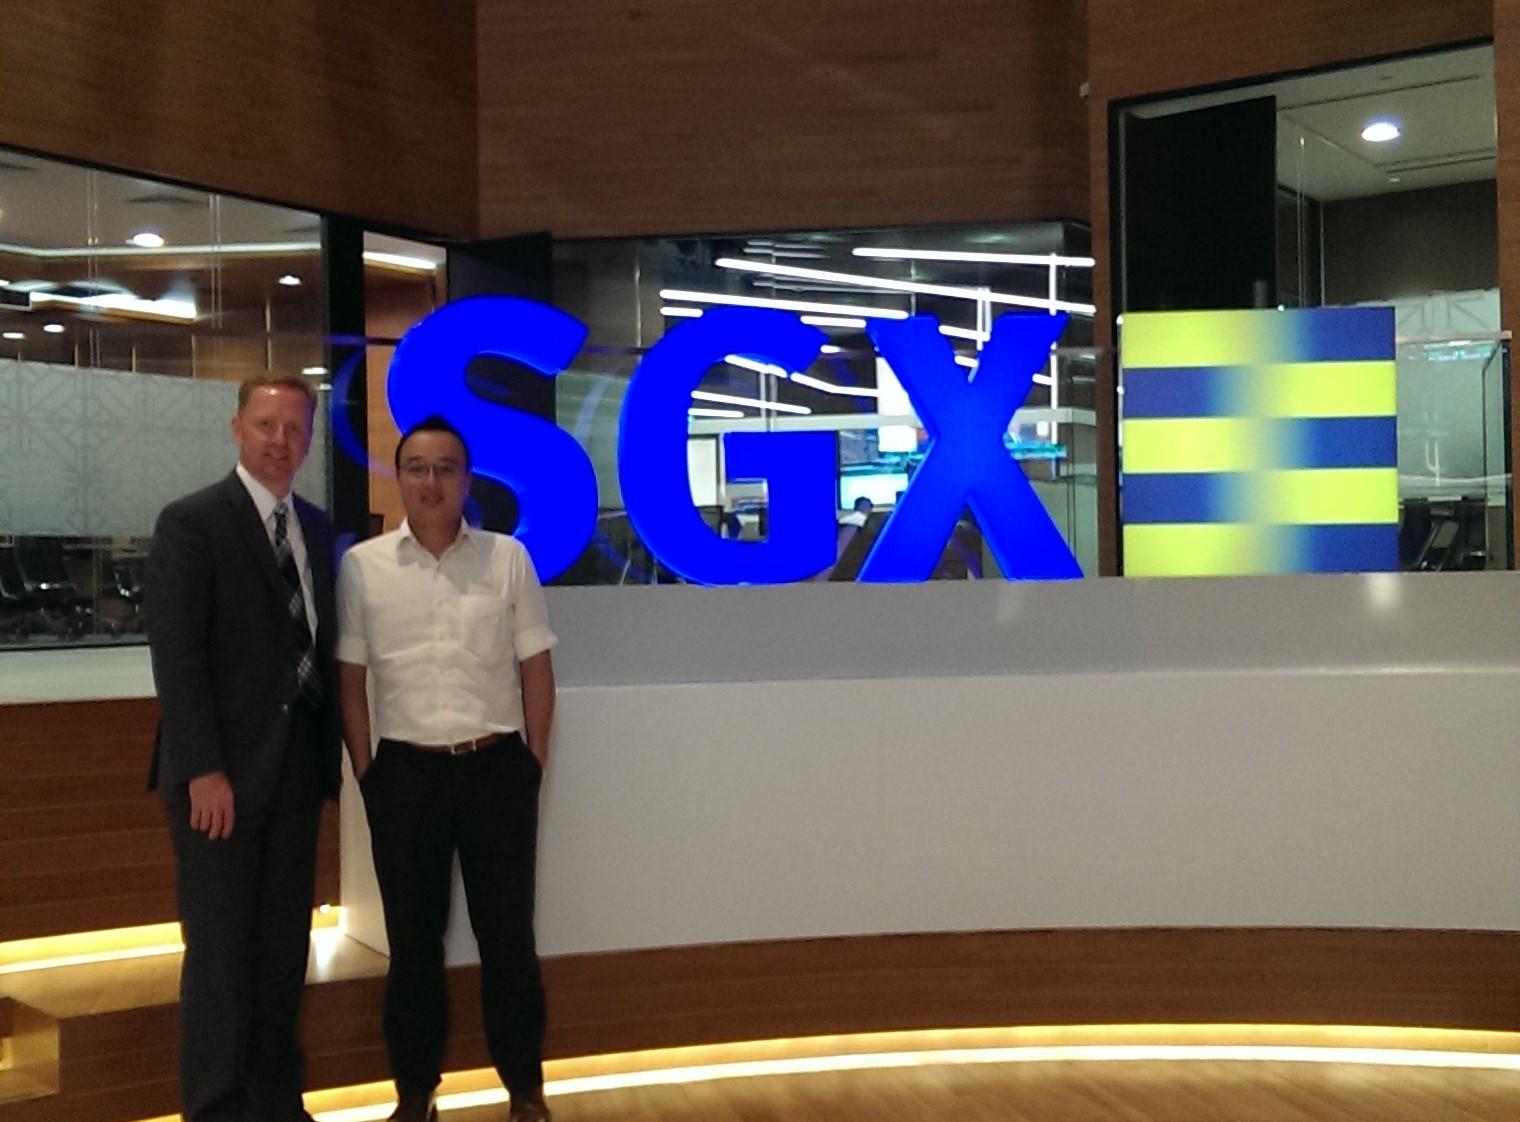 Ryan Hessenthaler with Darrell Lim, Vice President, Head of Investor Relations